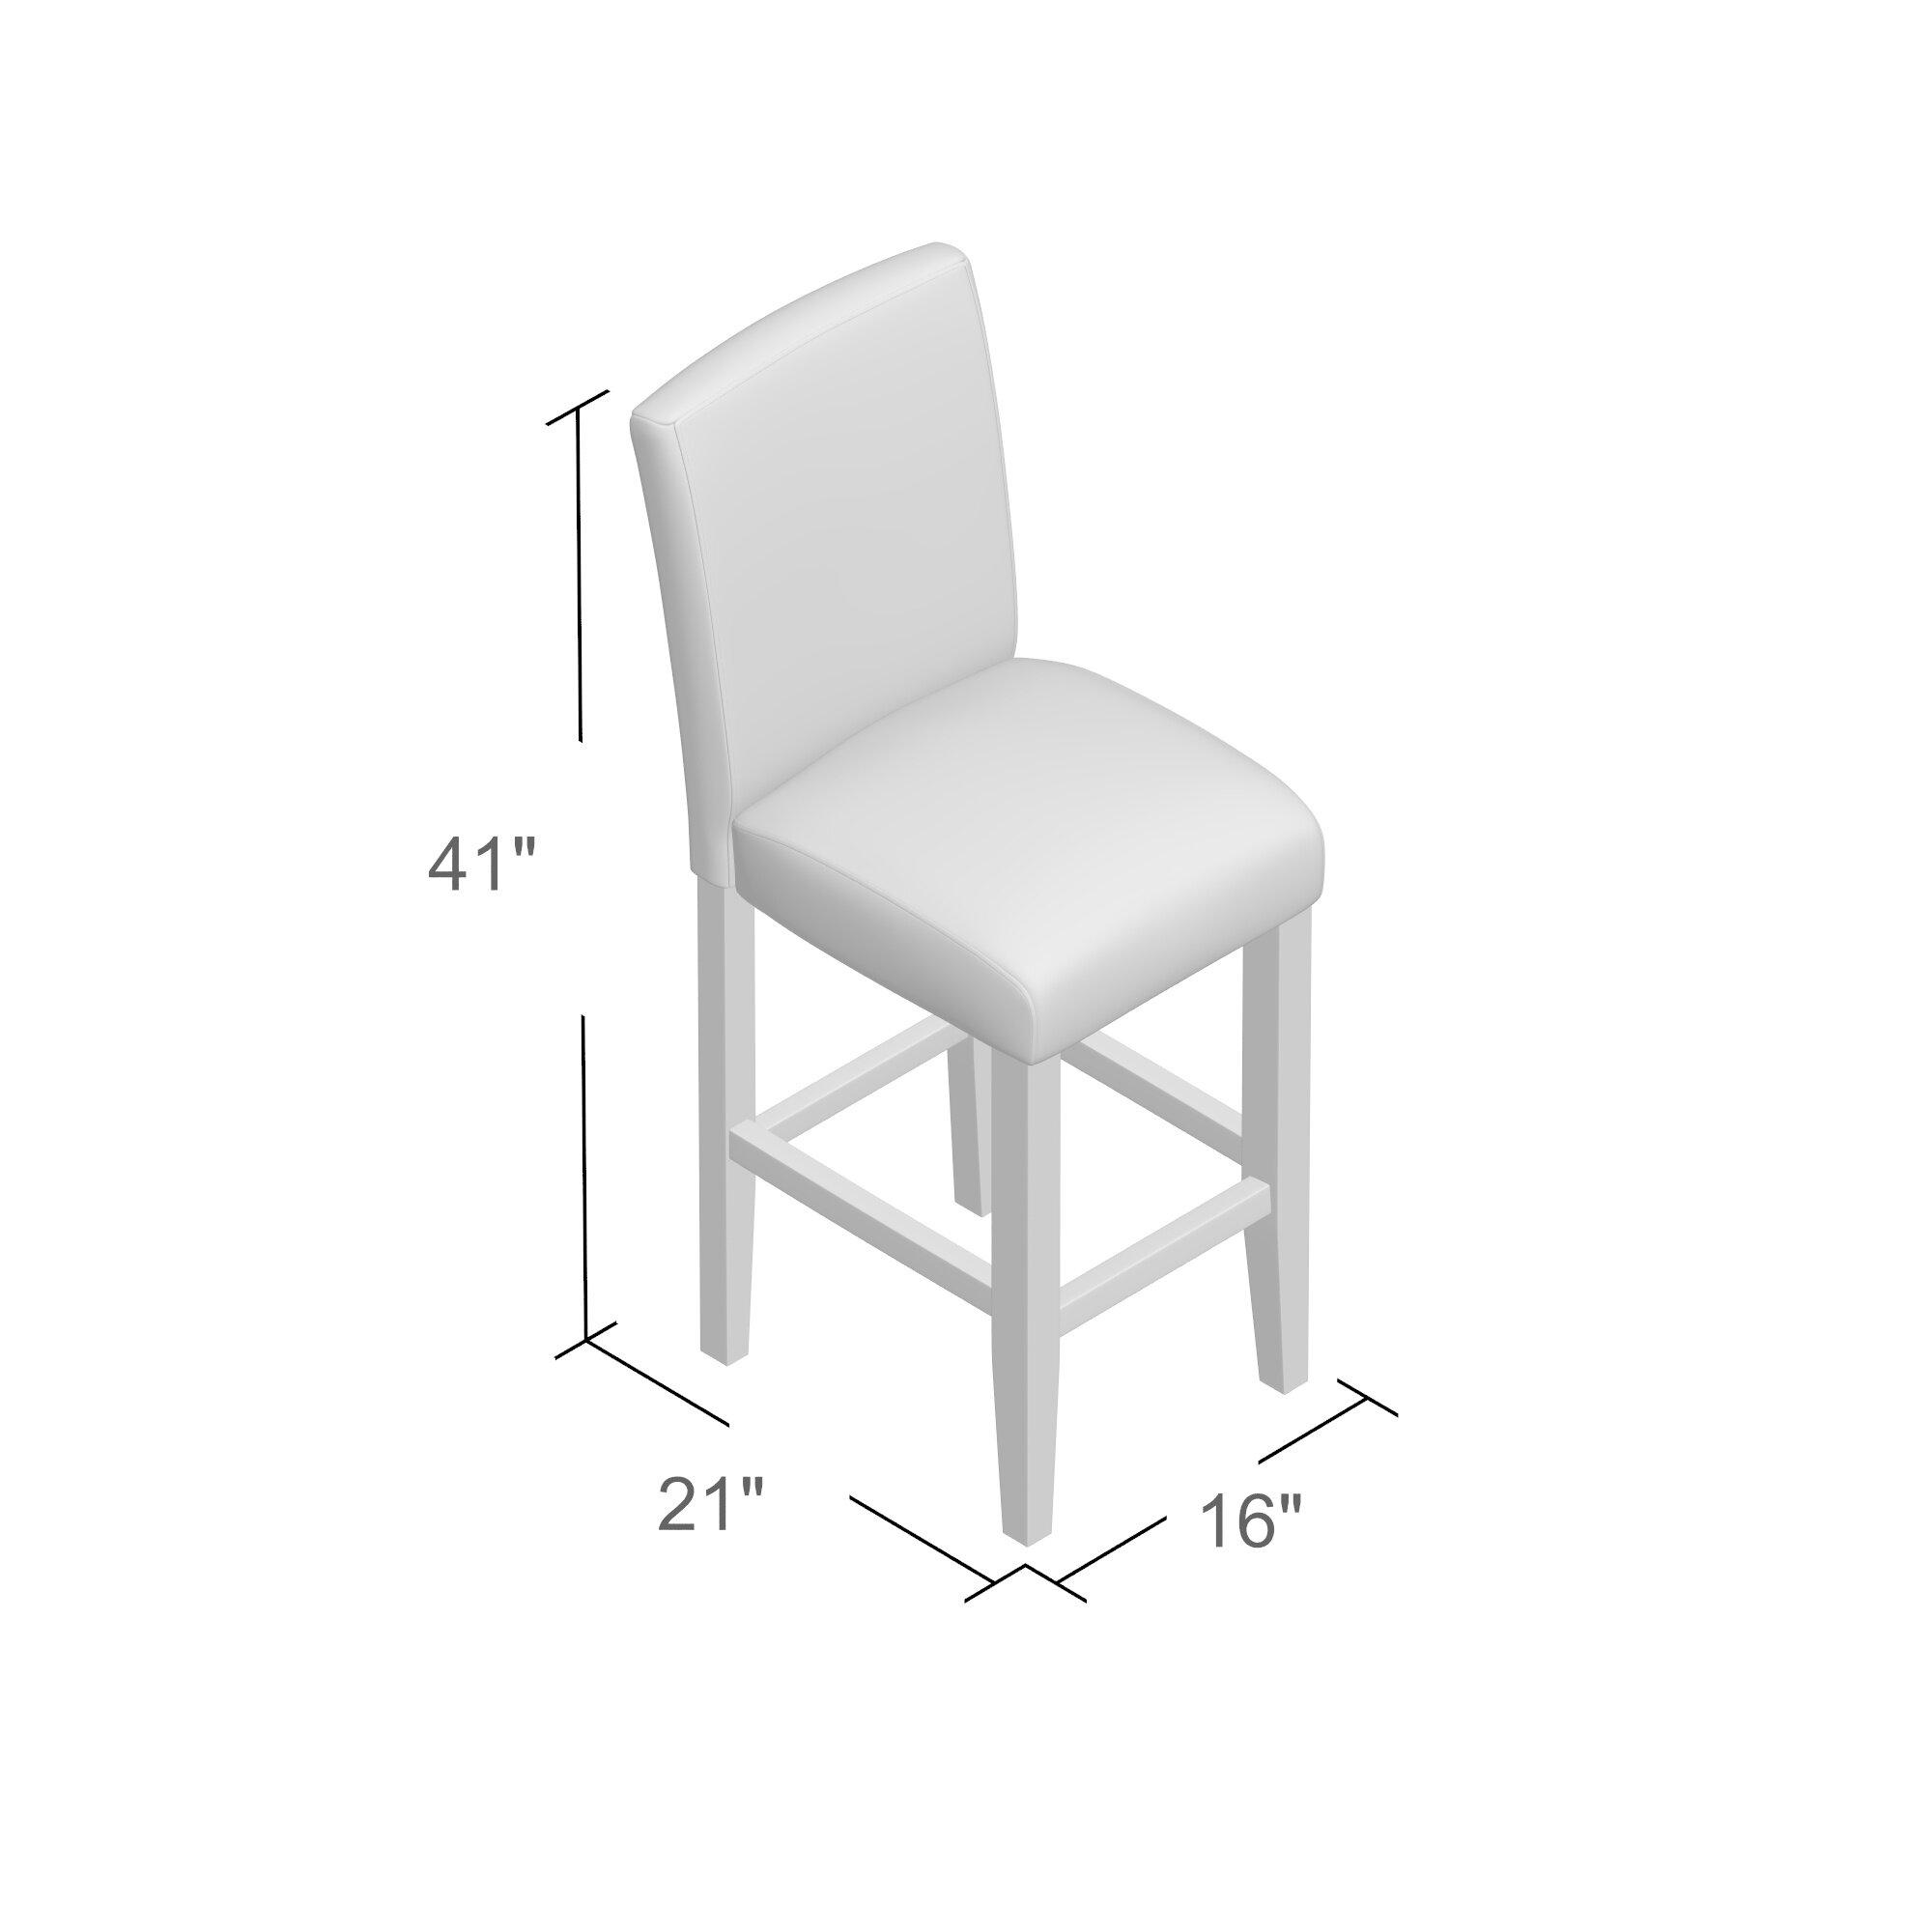 Phenomenal Details About Wrought Studio Poe 26 Bar Stool Set Of 2 Evergreenethics Interior Chair Design Evergreenethicsorg